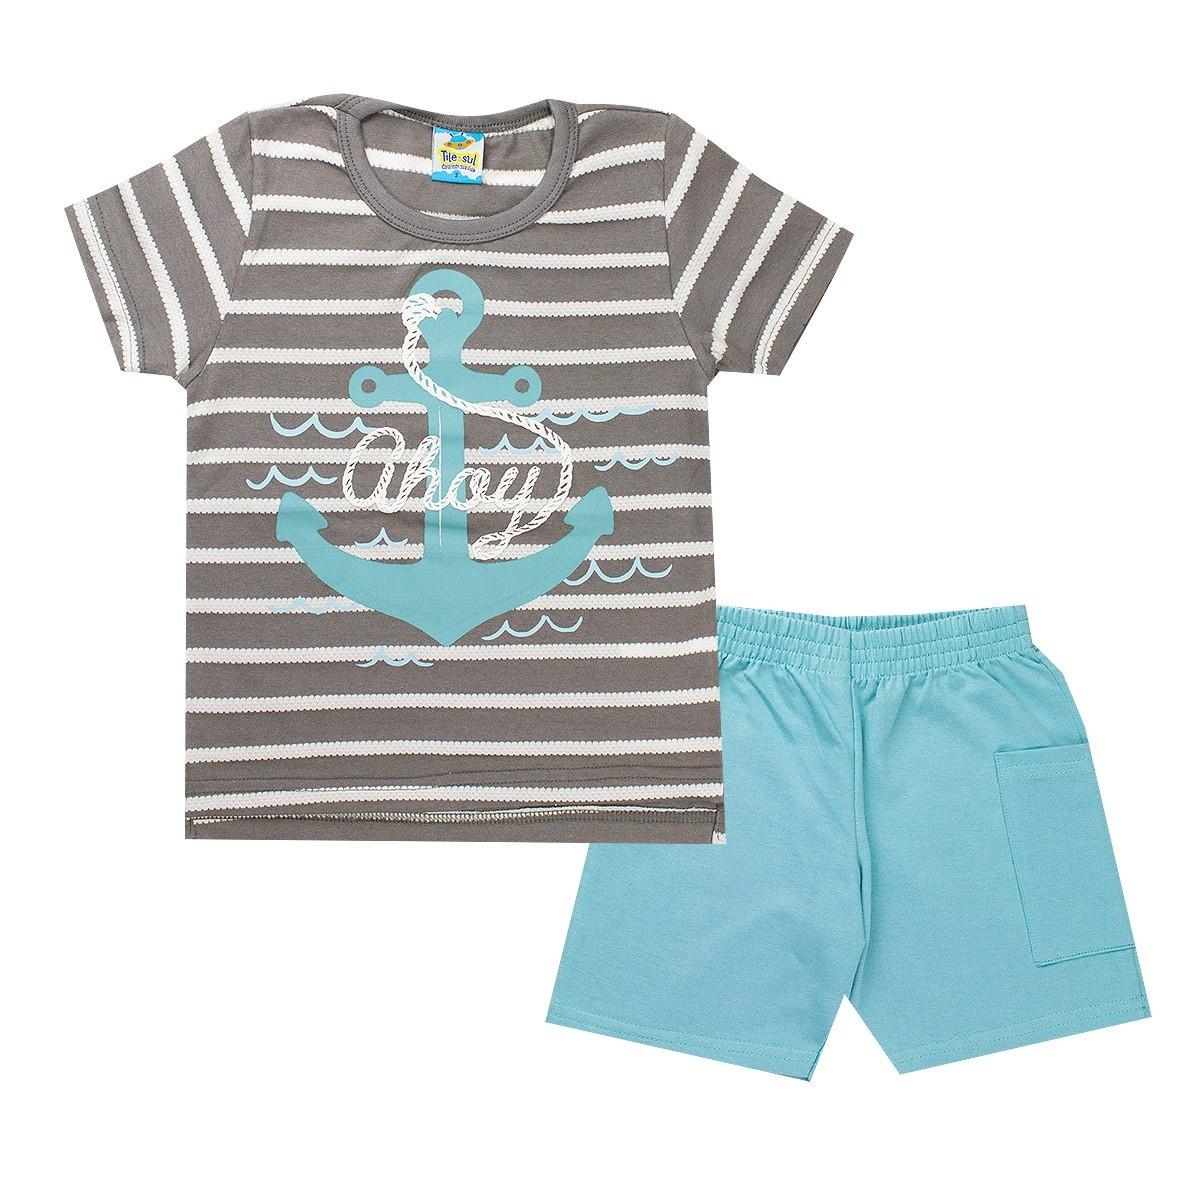 Conjunto Infantil Masculino Ahoy Listra Cinza - Tileesul